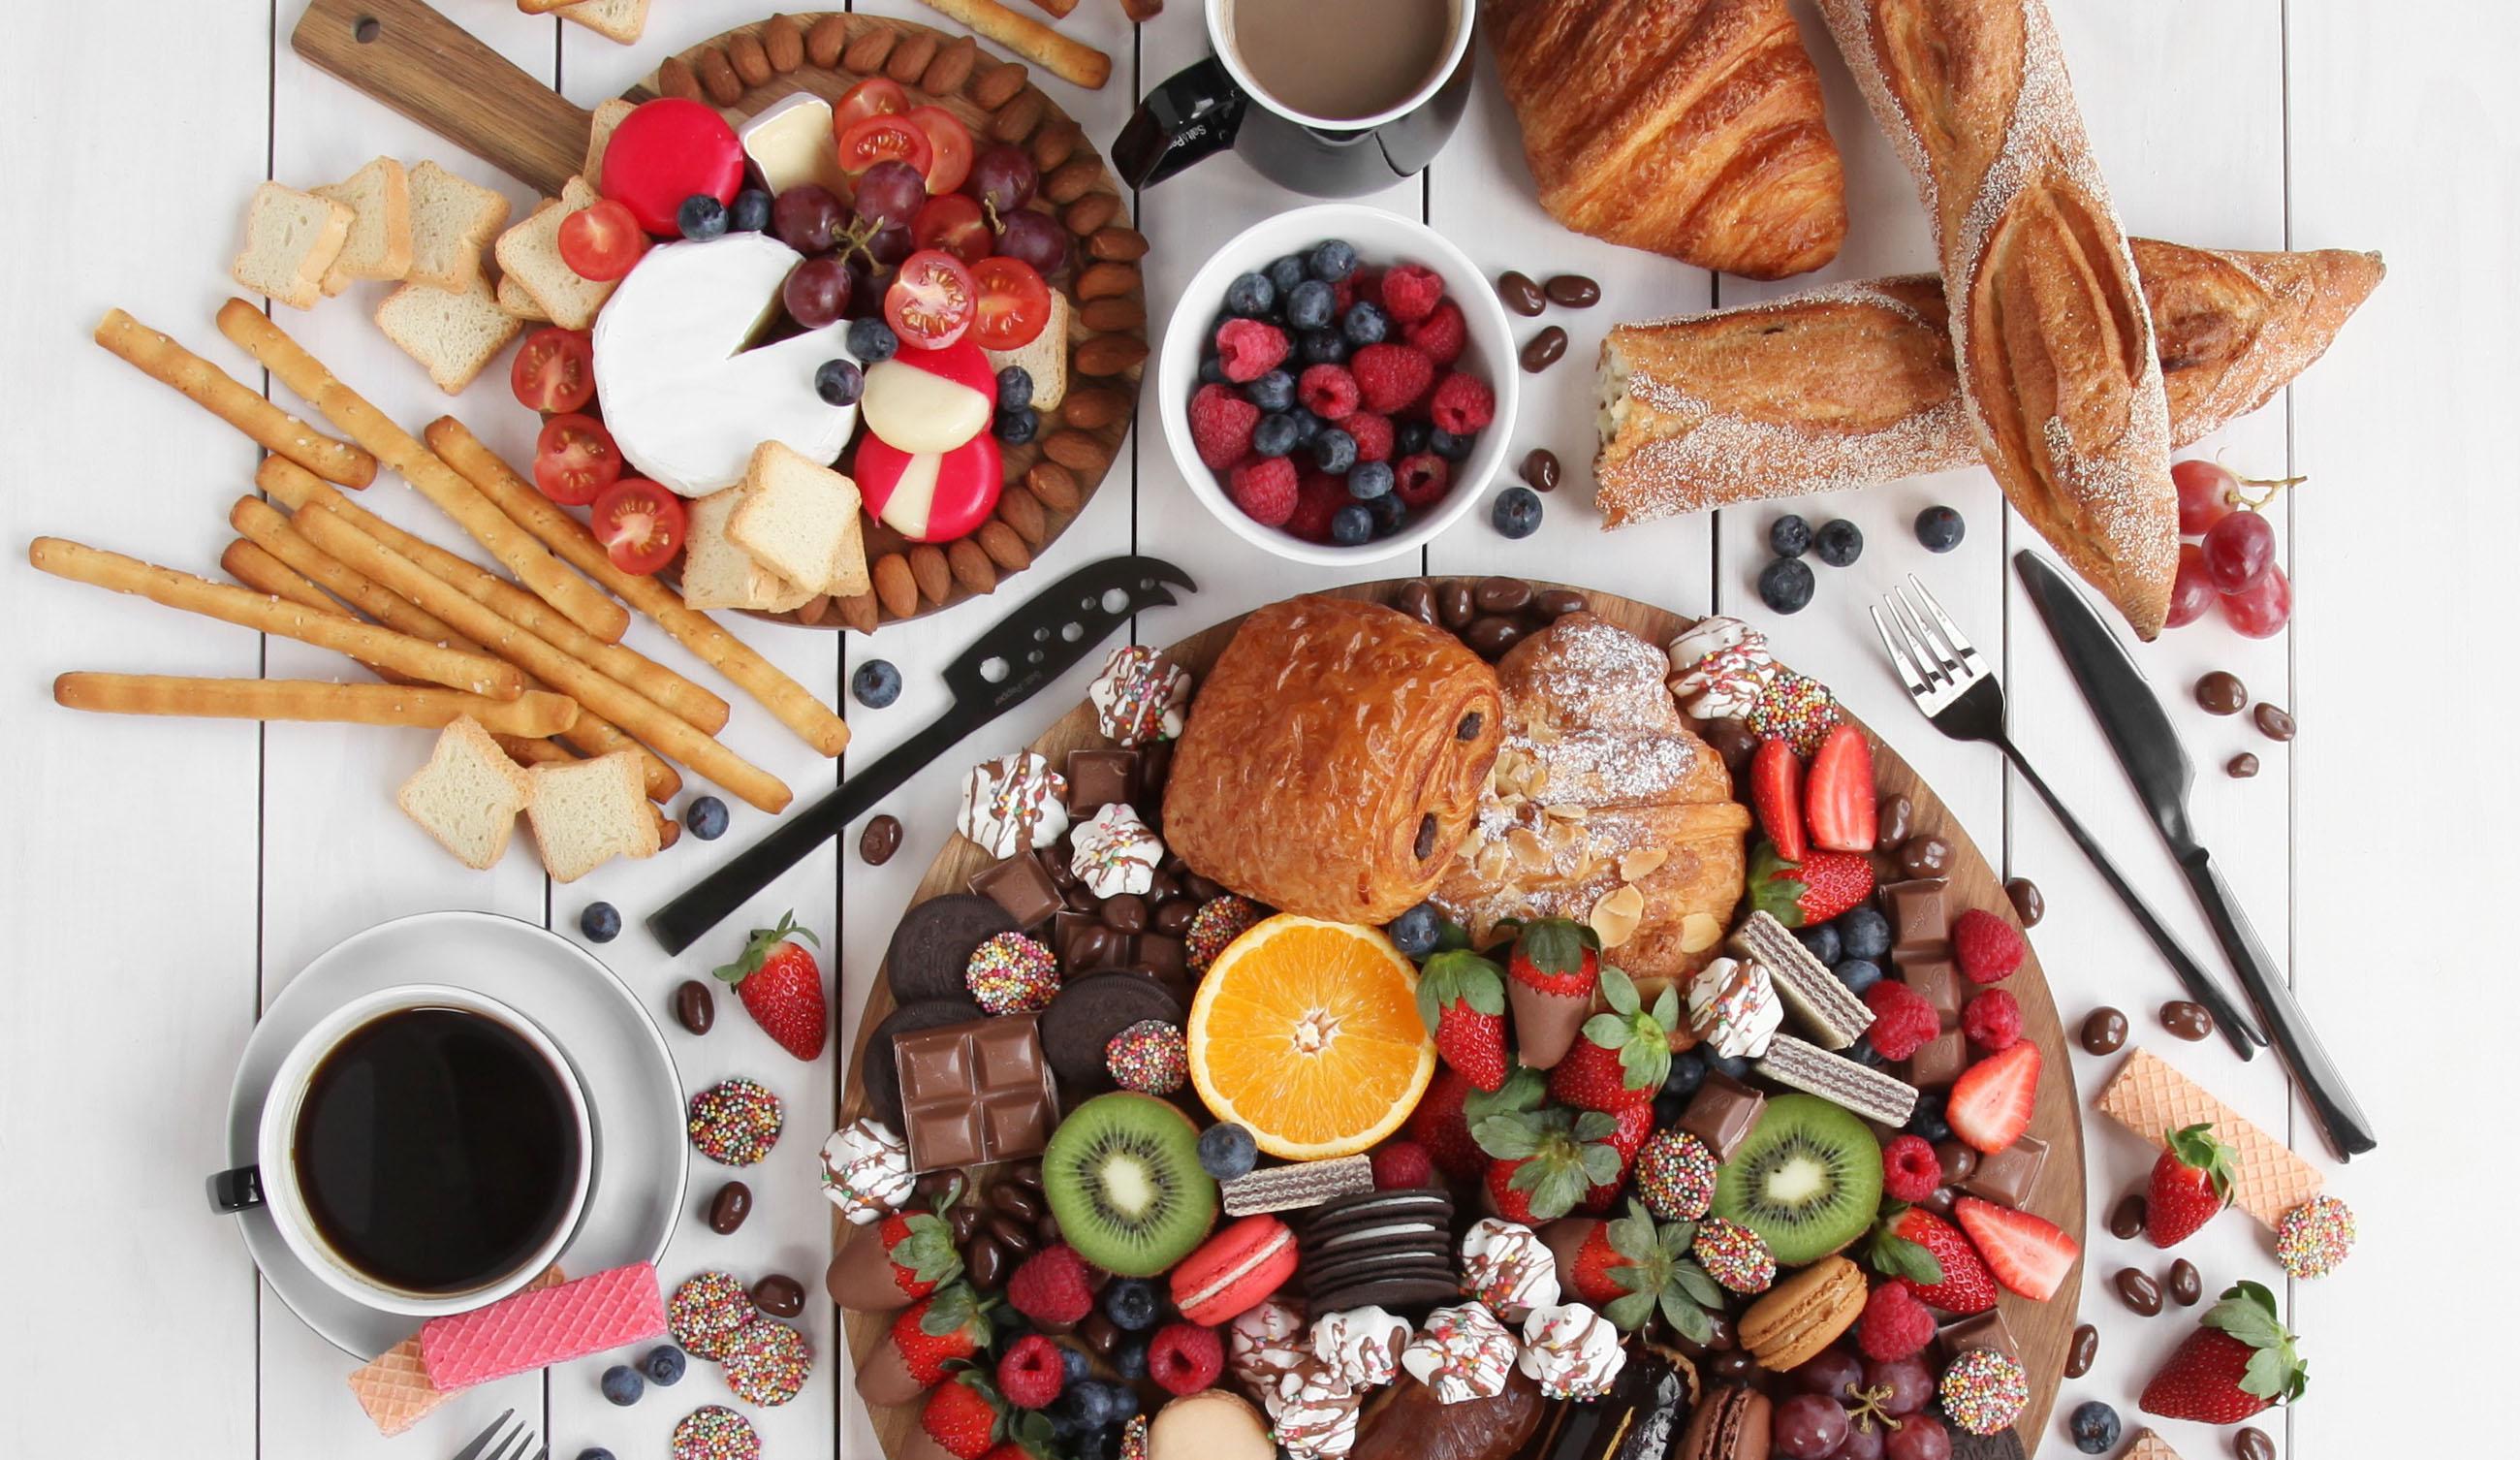 mastering-food-flat-lays-design-by-aikonik-banner.jpg